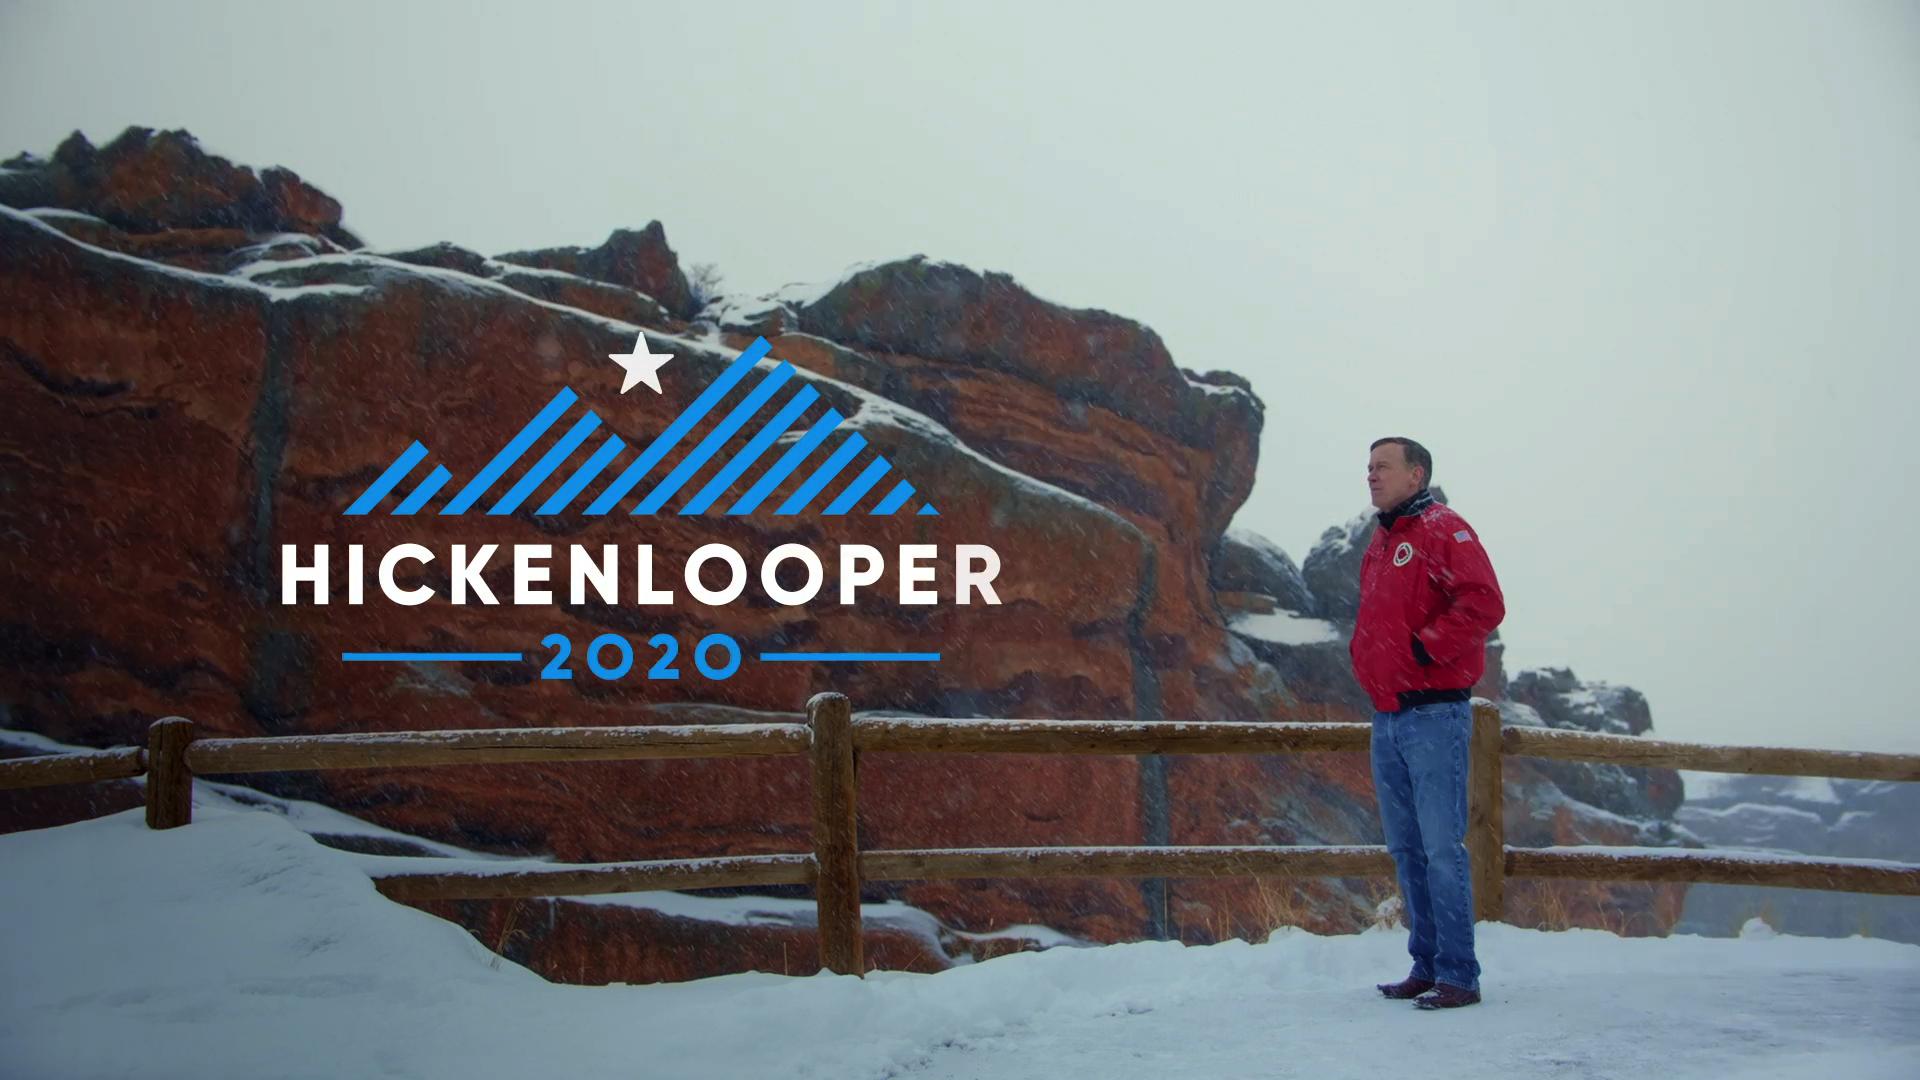 hickenlooper_tested__08.jpg